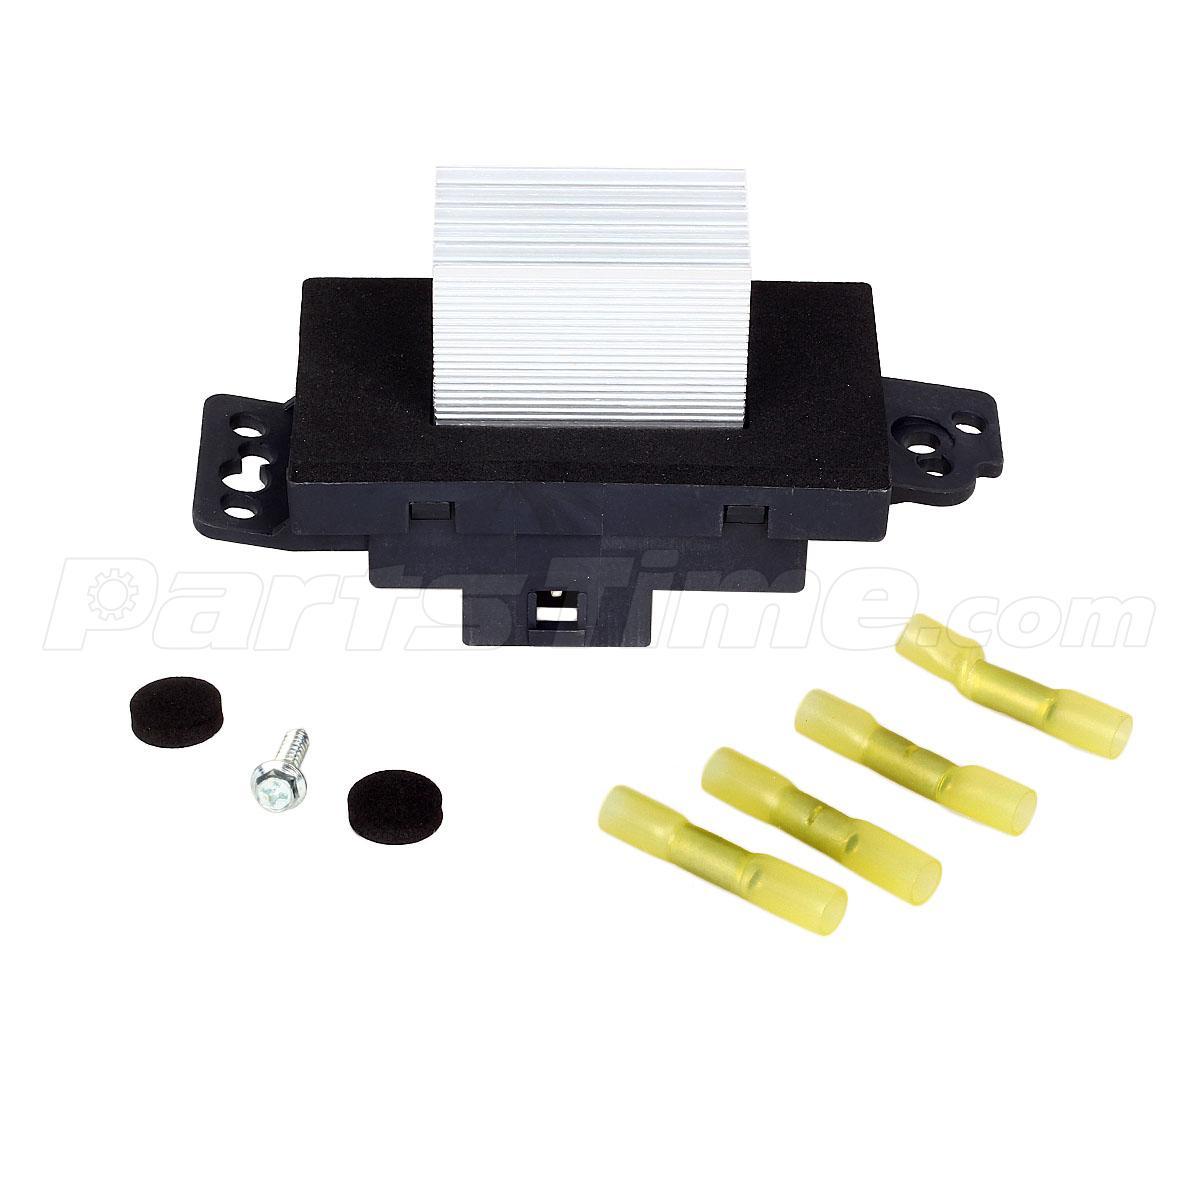 Chevy Impala Blower Motor Resistor: HVAC Blower Motor Resistor Regulator For 04-13 Chevrolet